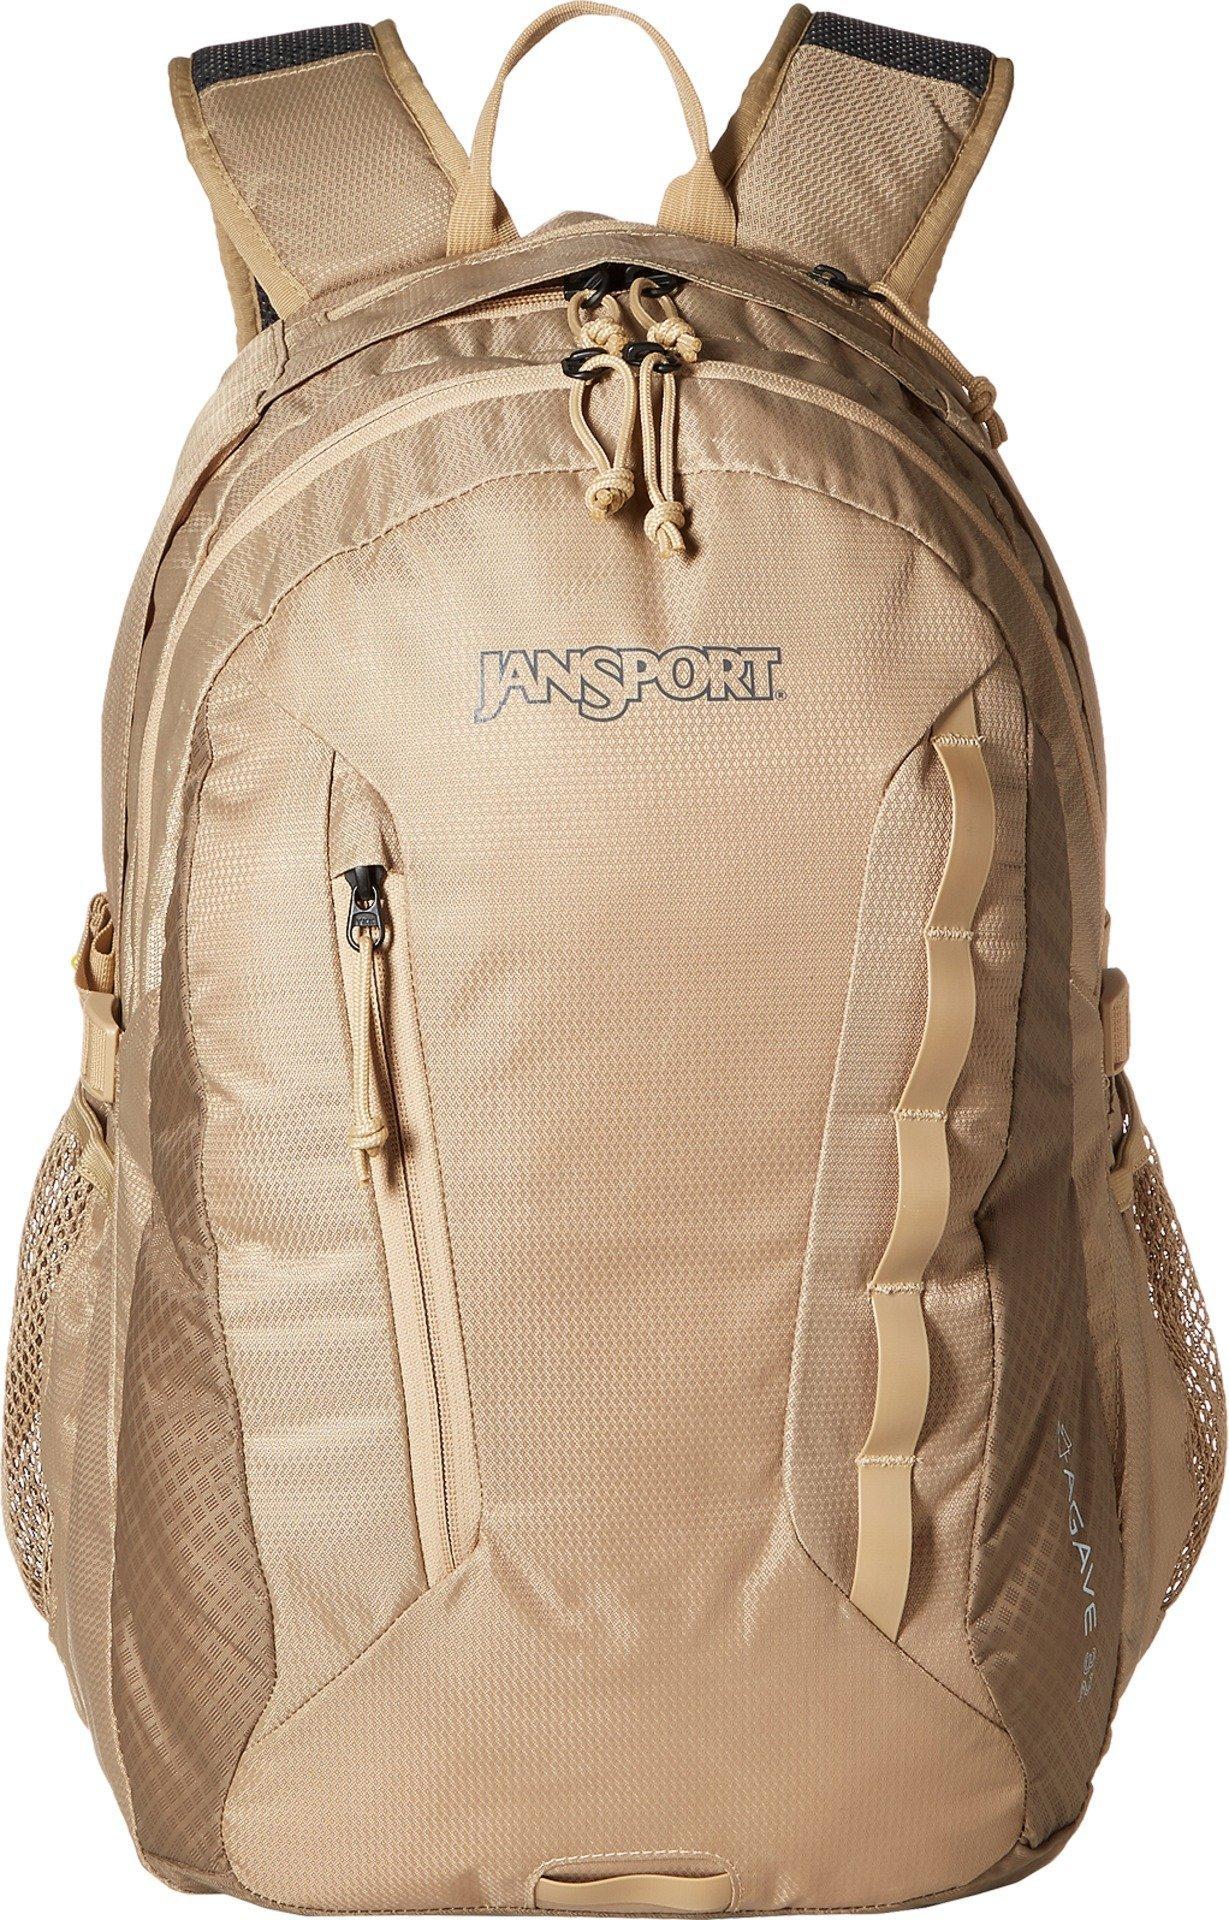 JanSport Unisex Agave Bozeman Brown/Field Tan One Size